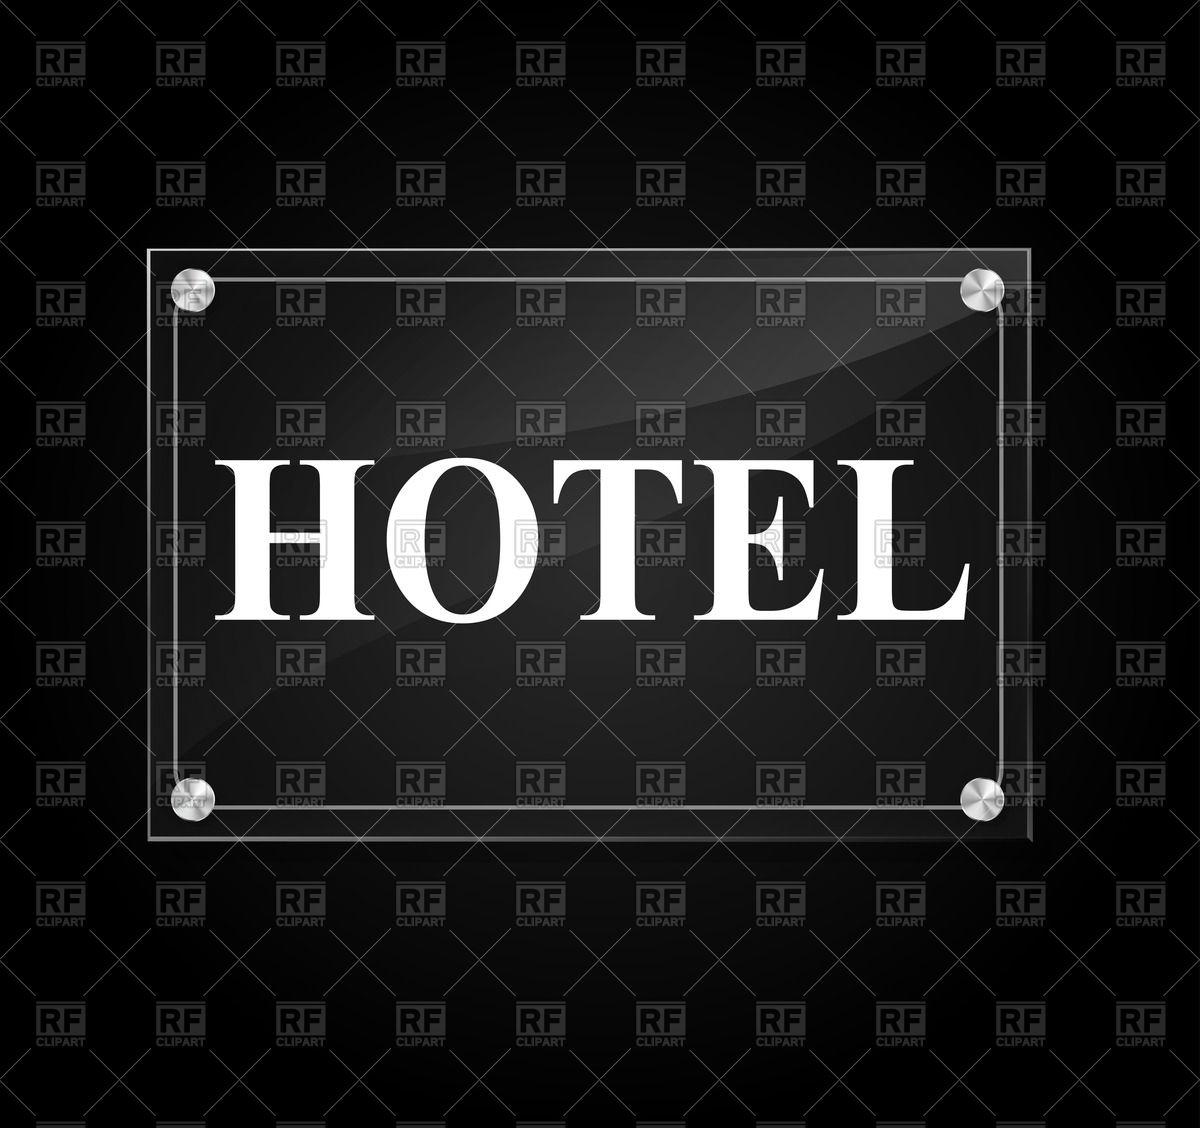 Black glass door plate with word Hotel Vector Image #70499.